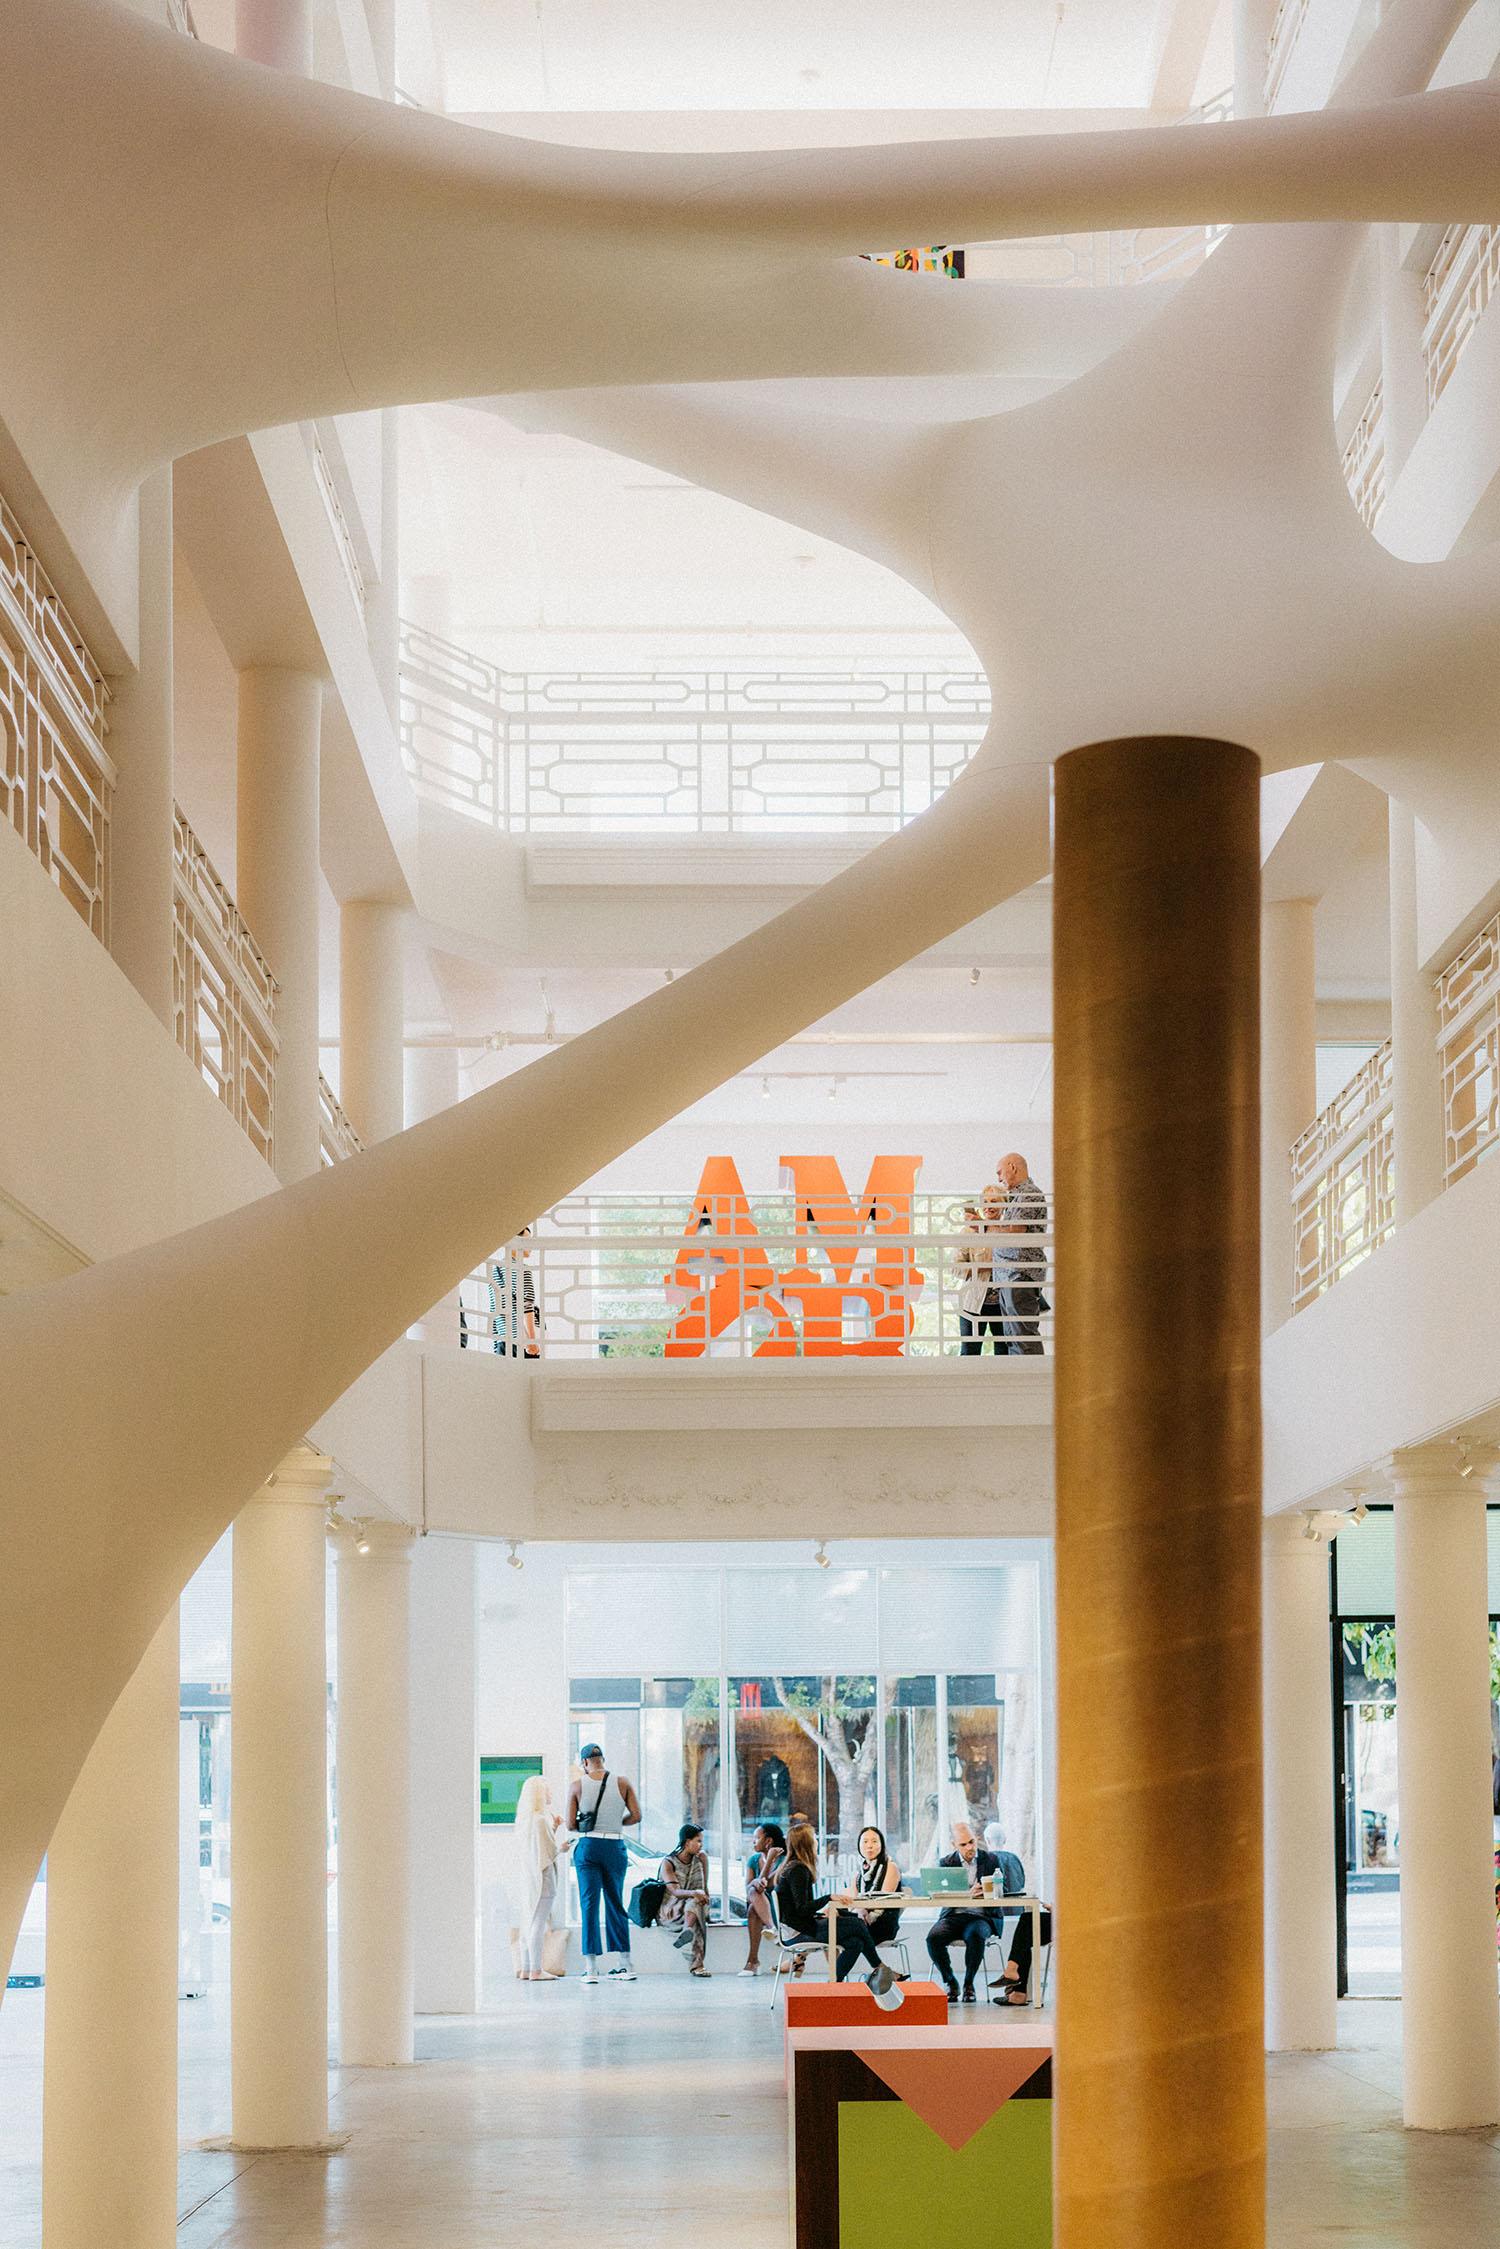 Zaha Hadid's Elastika sculpture